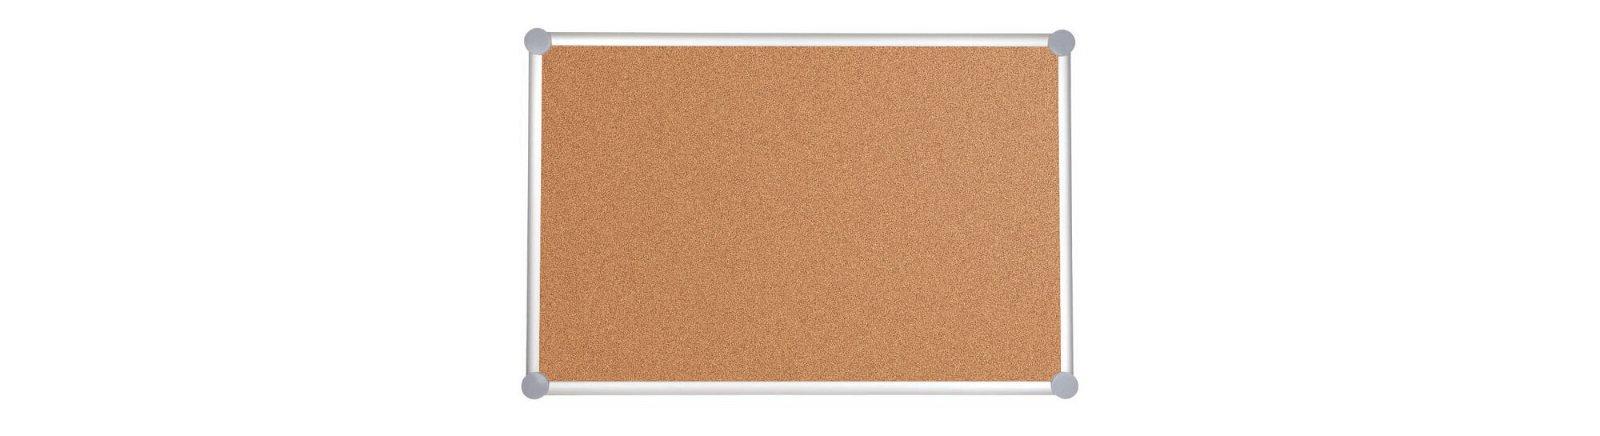 Pinnboard 2000 MAULpro, Kork, 90x180 cm, grau